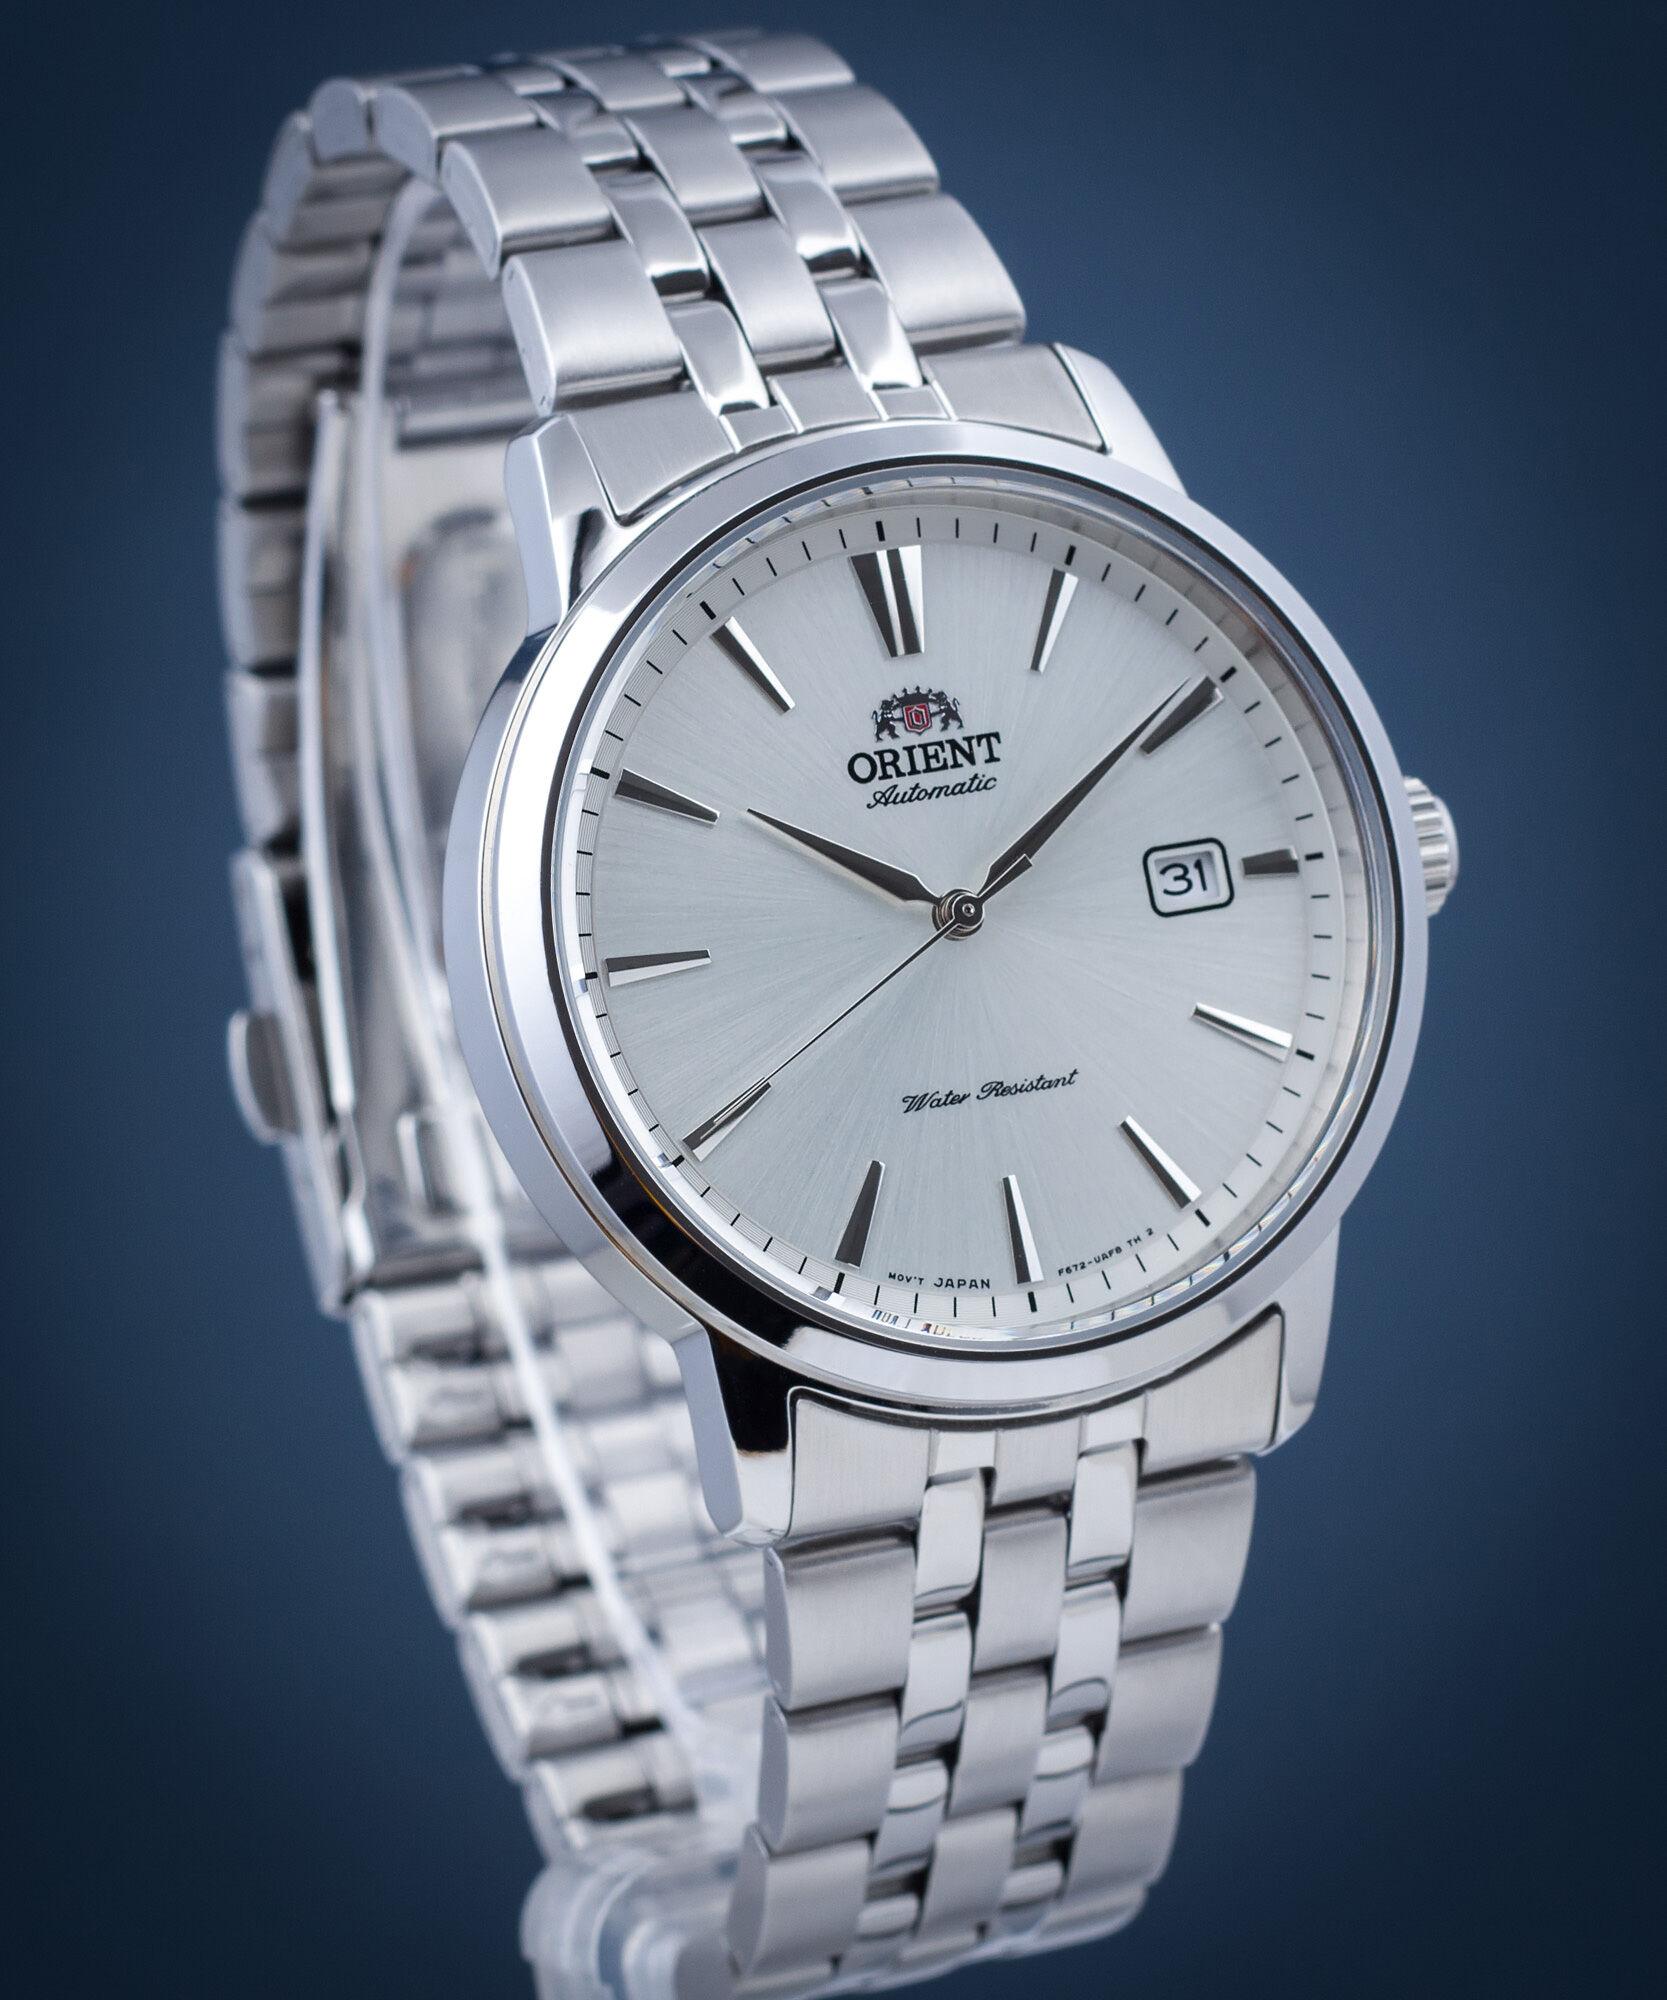 Zegarek męski Orient Classic Automatic